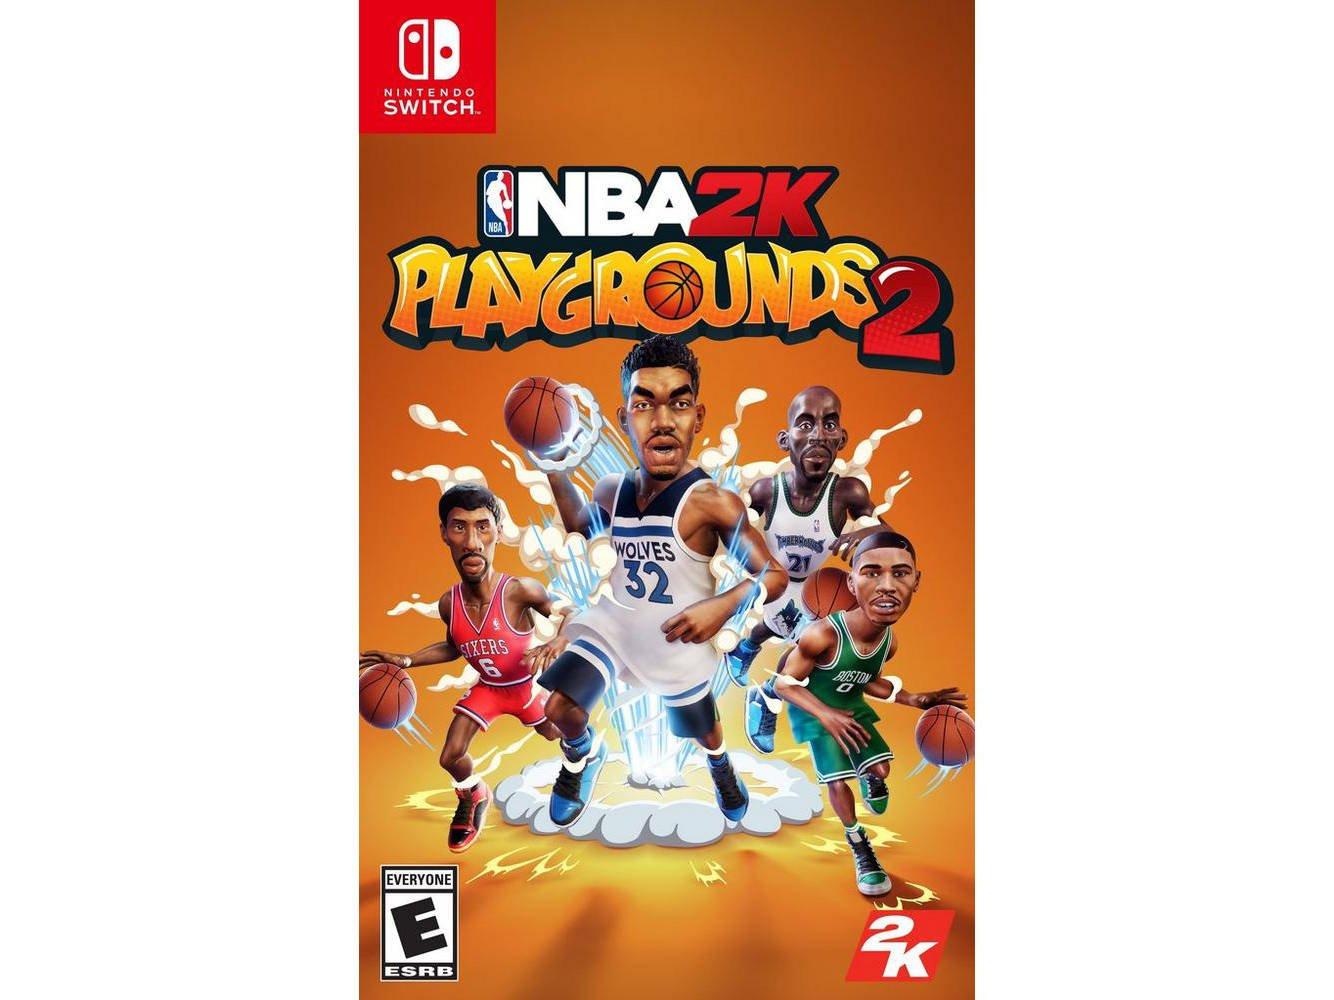 NBA 2k Playgrounds 2 Nintendo Switch